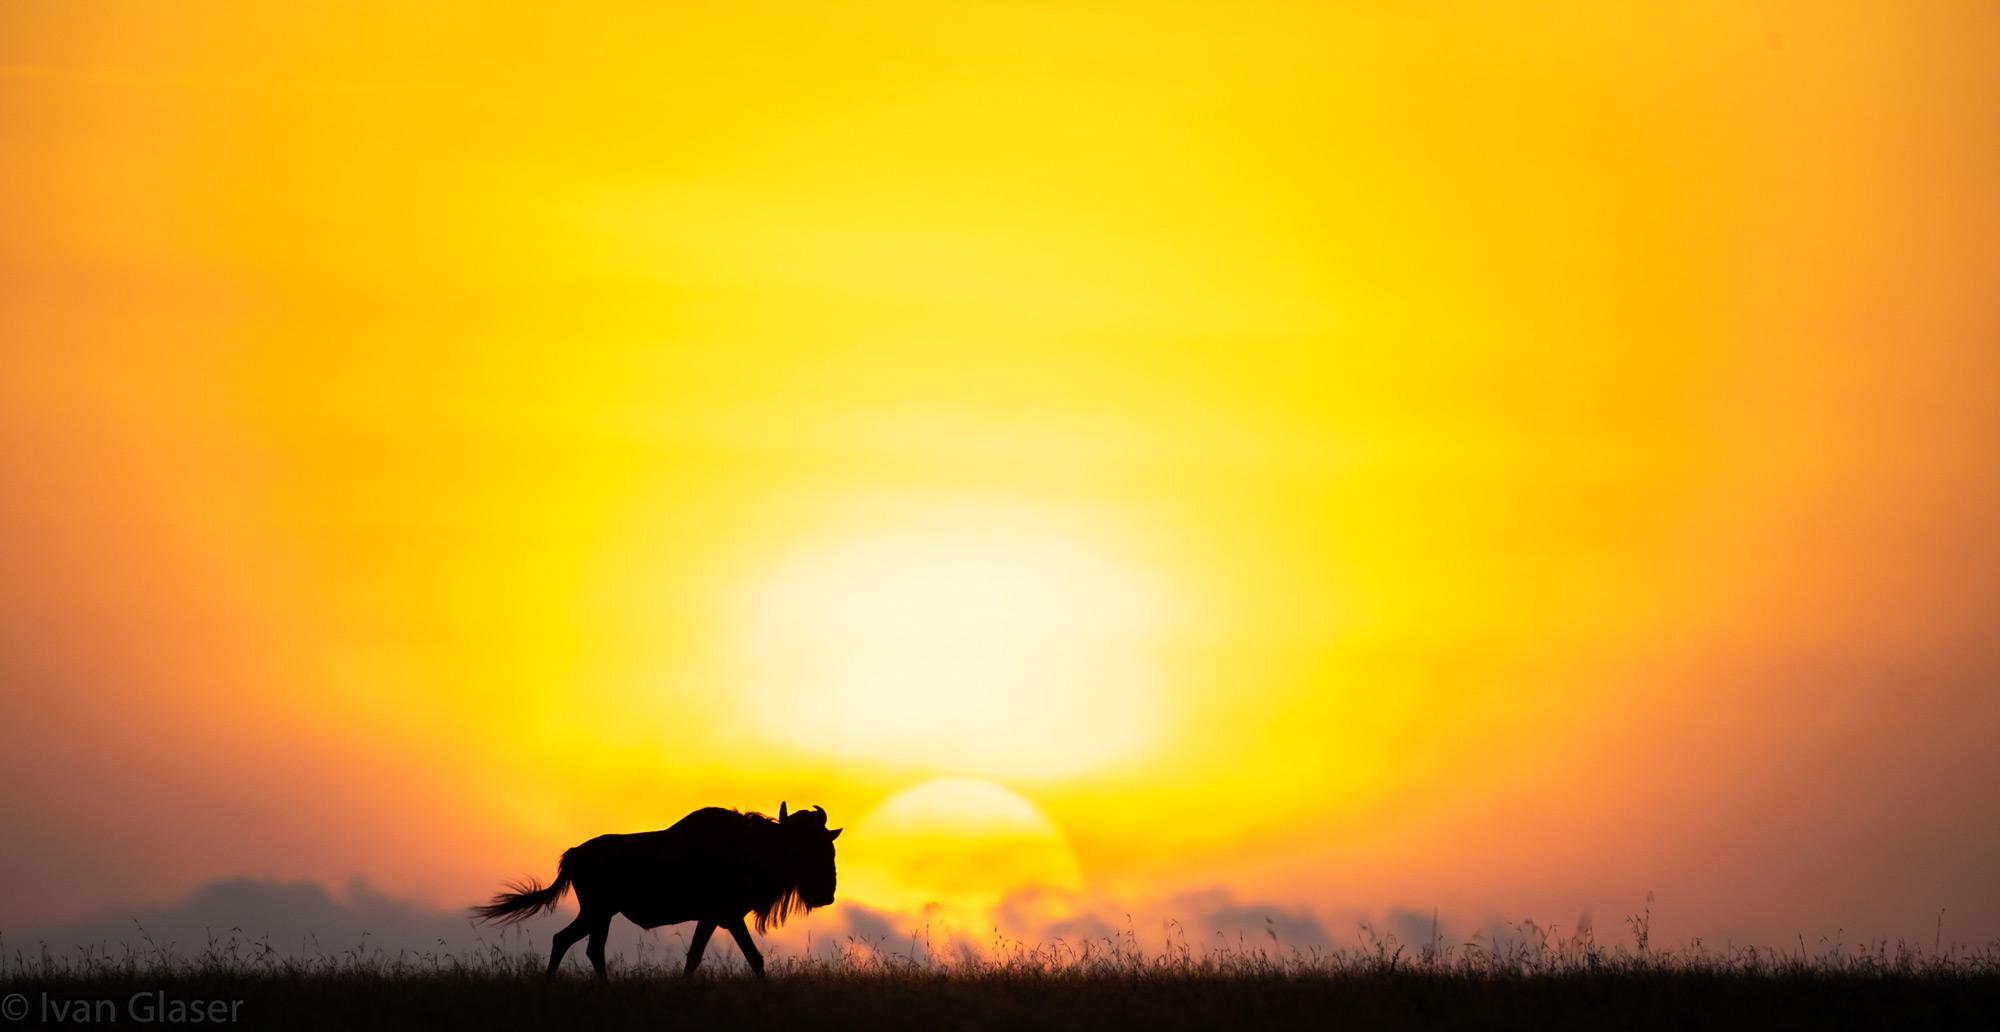 Wildebeest at sunrise in Maasai Mara